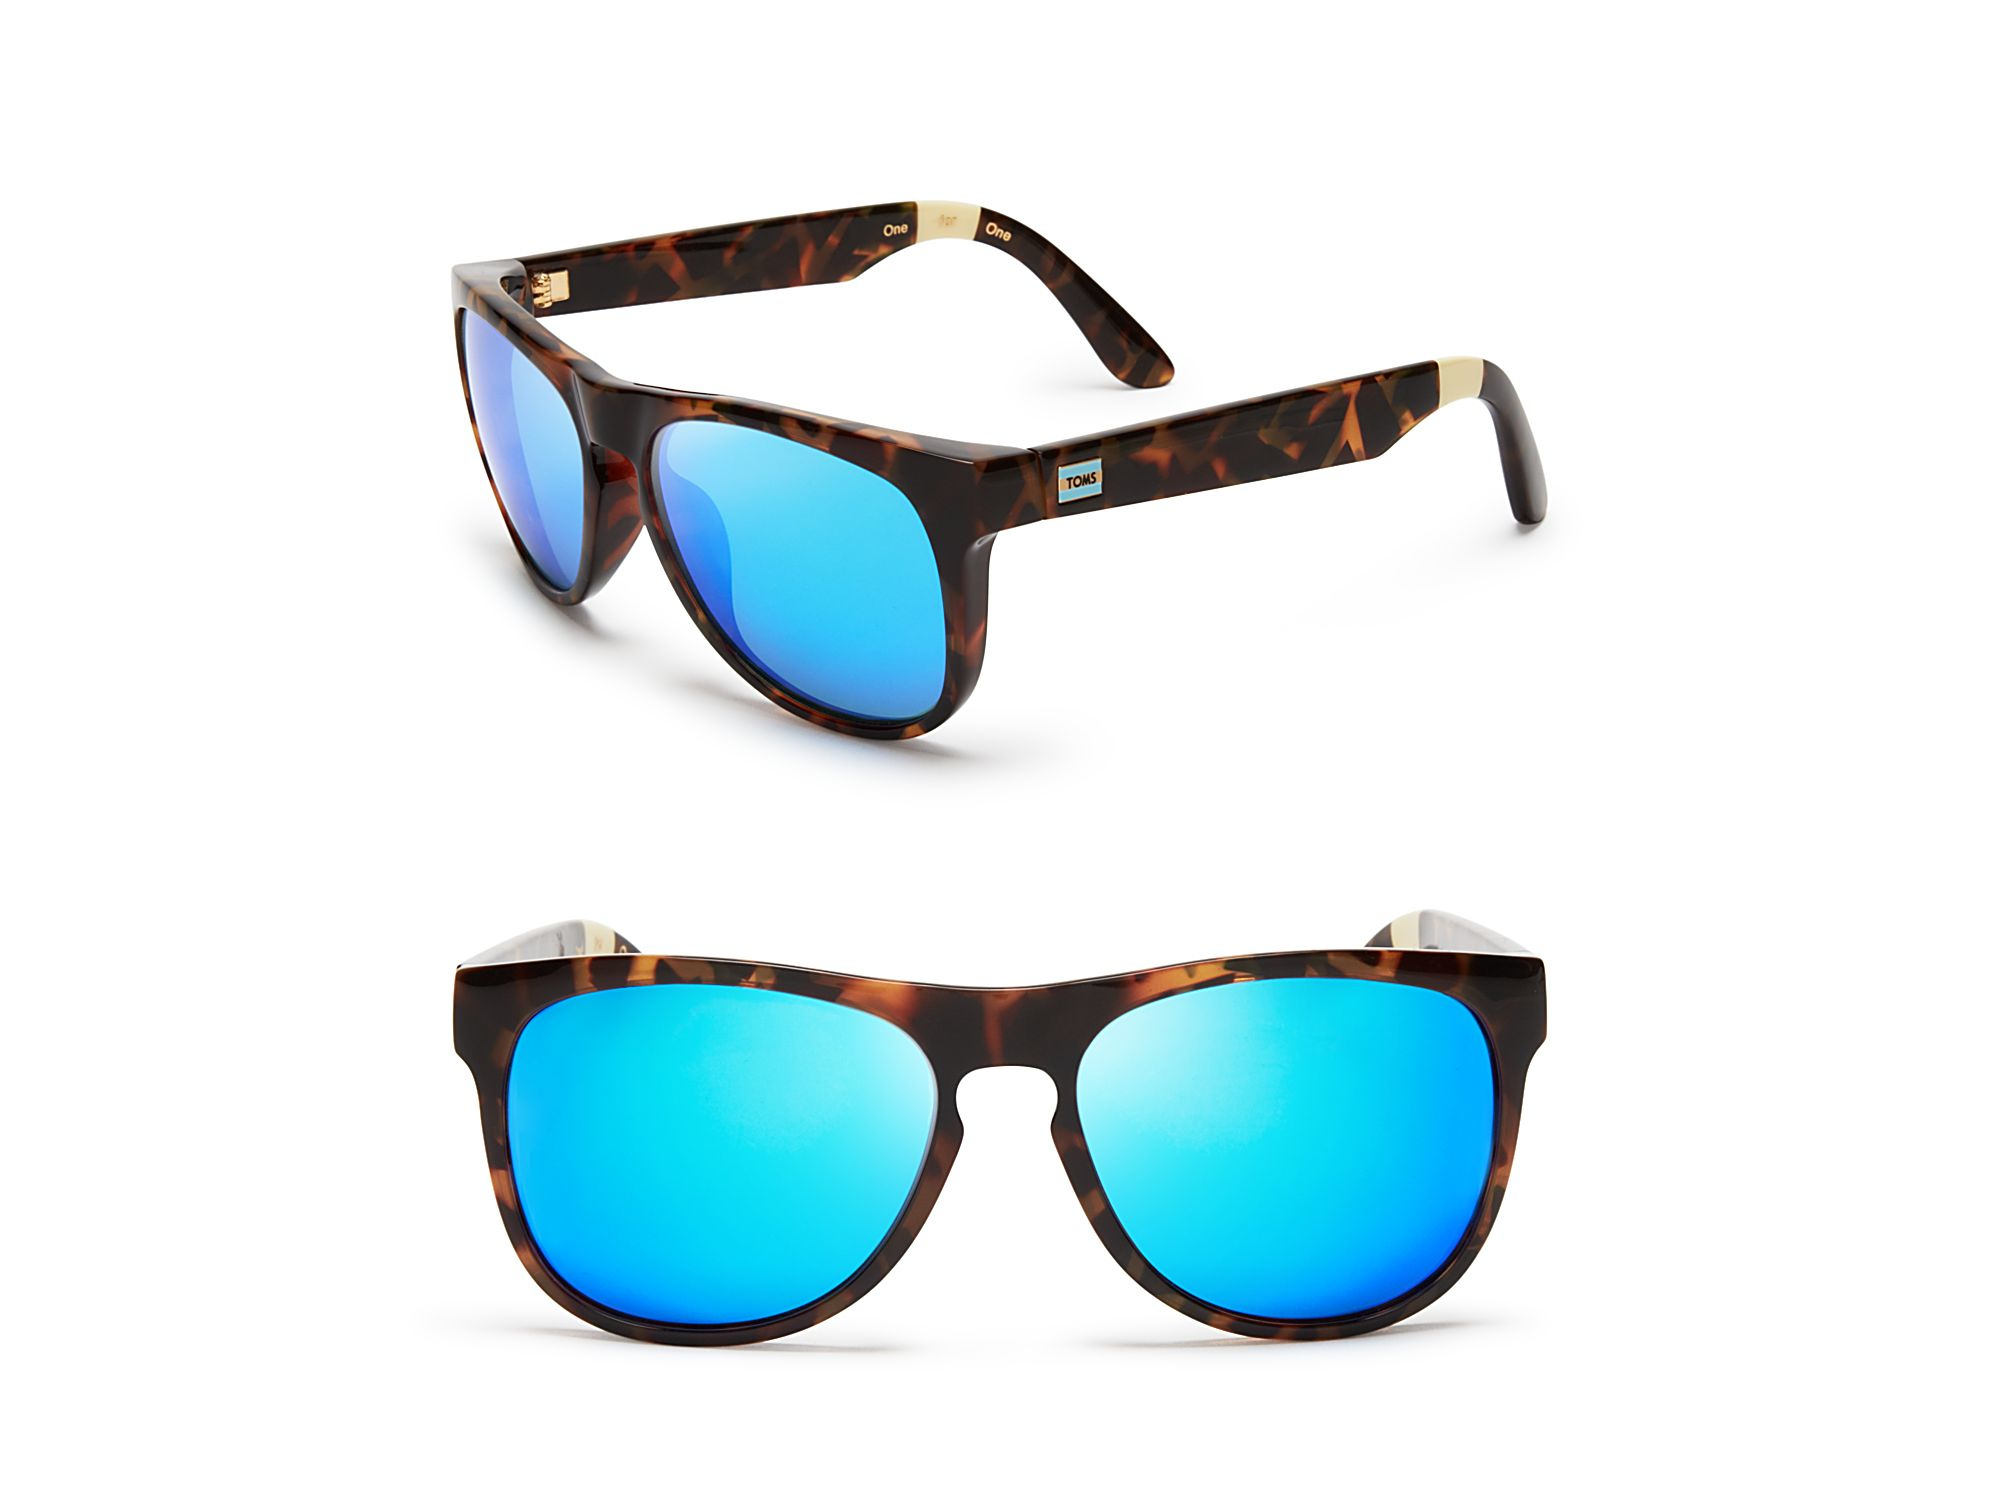 b2508e067641 TOMS Phoenix Mirrored Sunglasses in Blue - Lyst